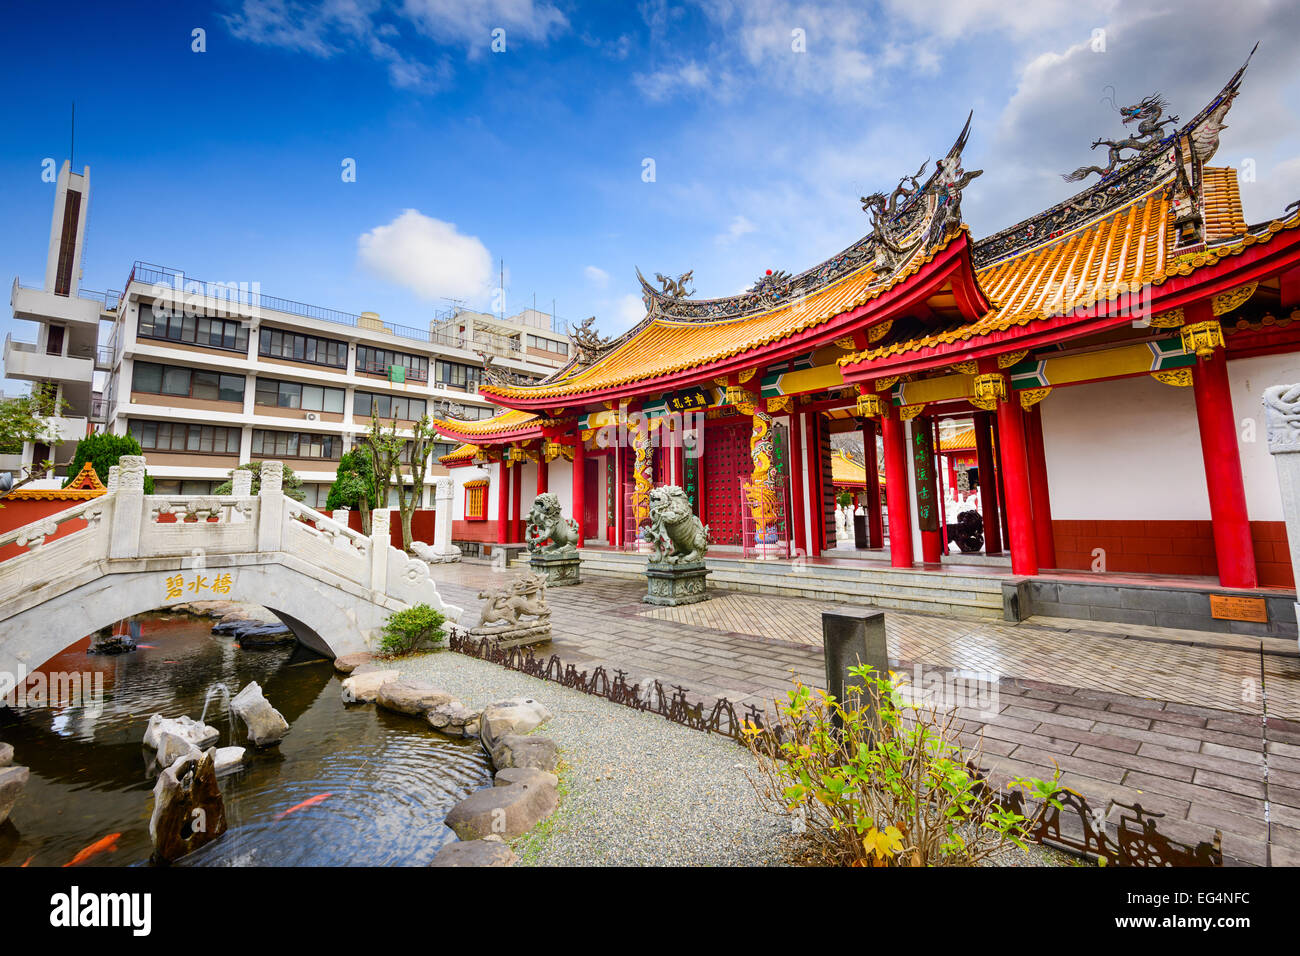 Confucius Shrine in Nagasaki, Japan - Stock Image